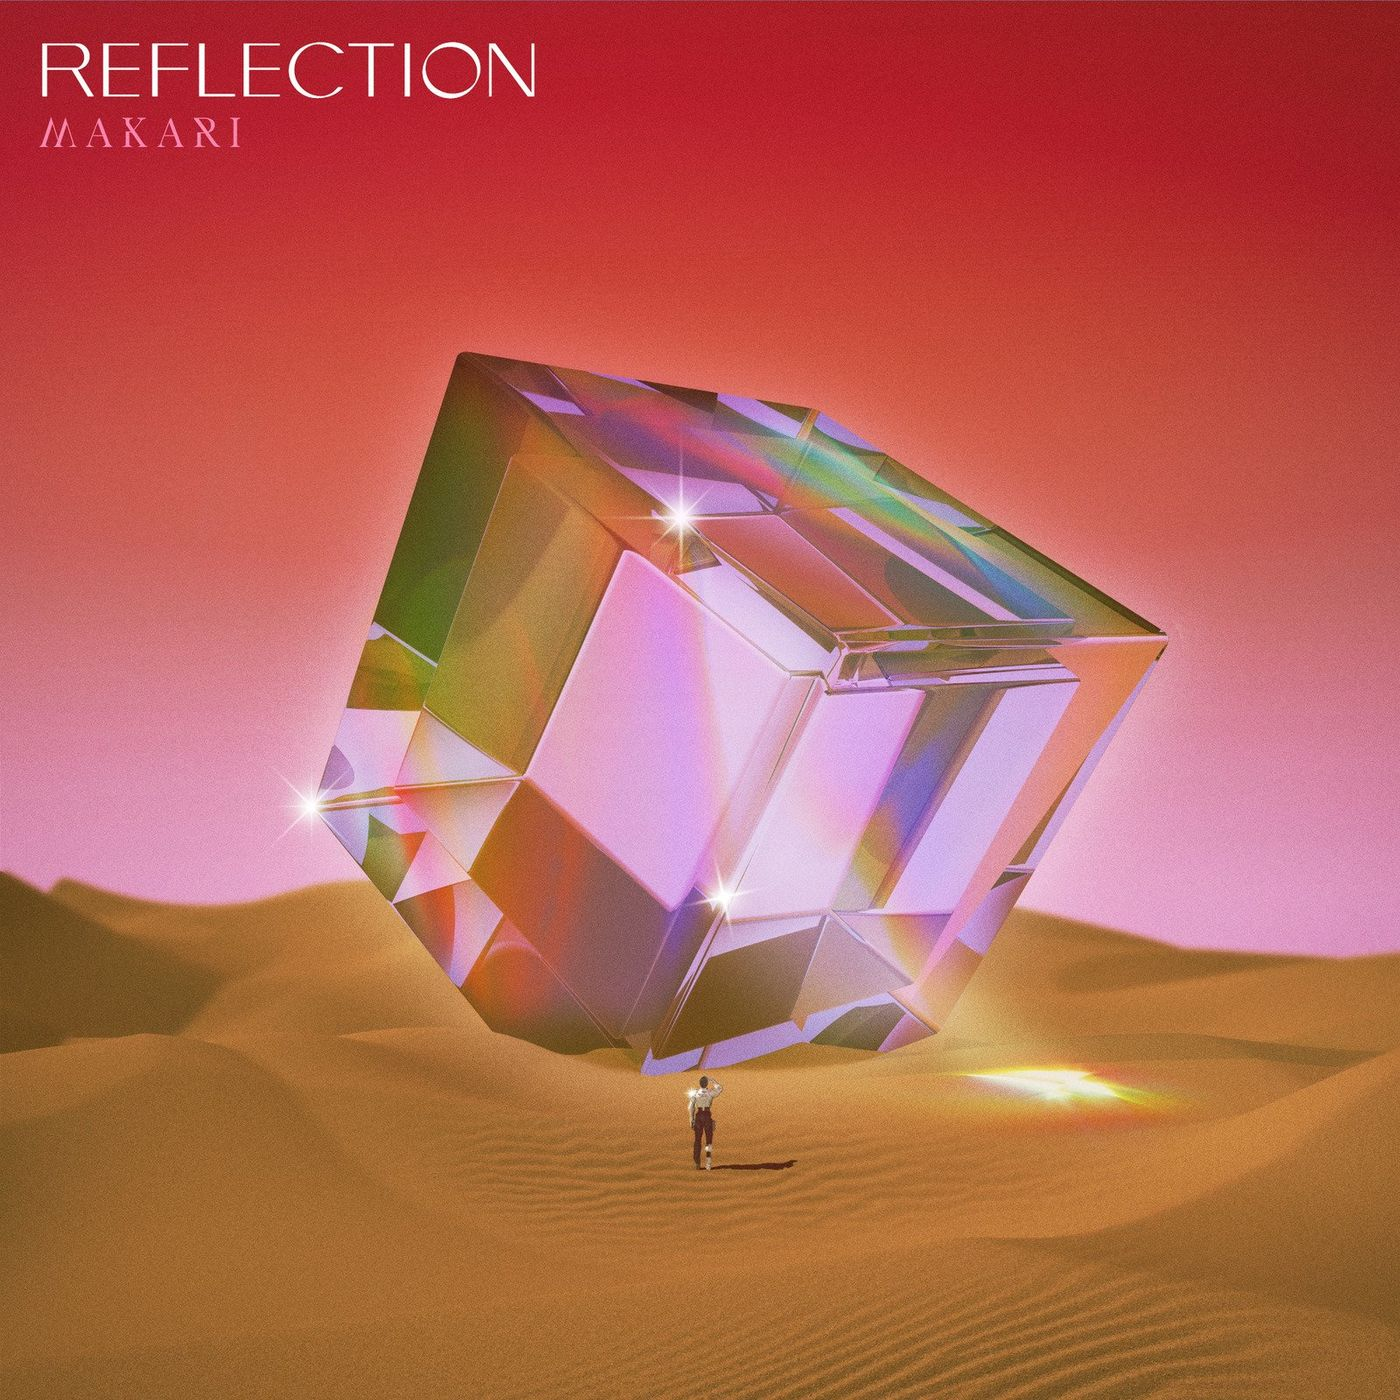 Makari - Reflection [single] (2020)